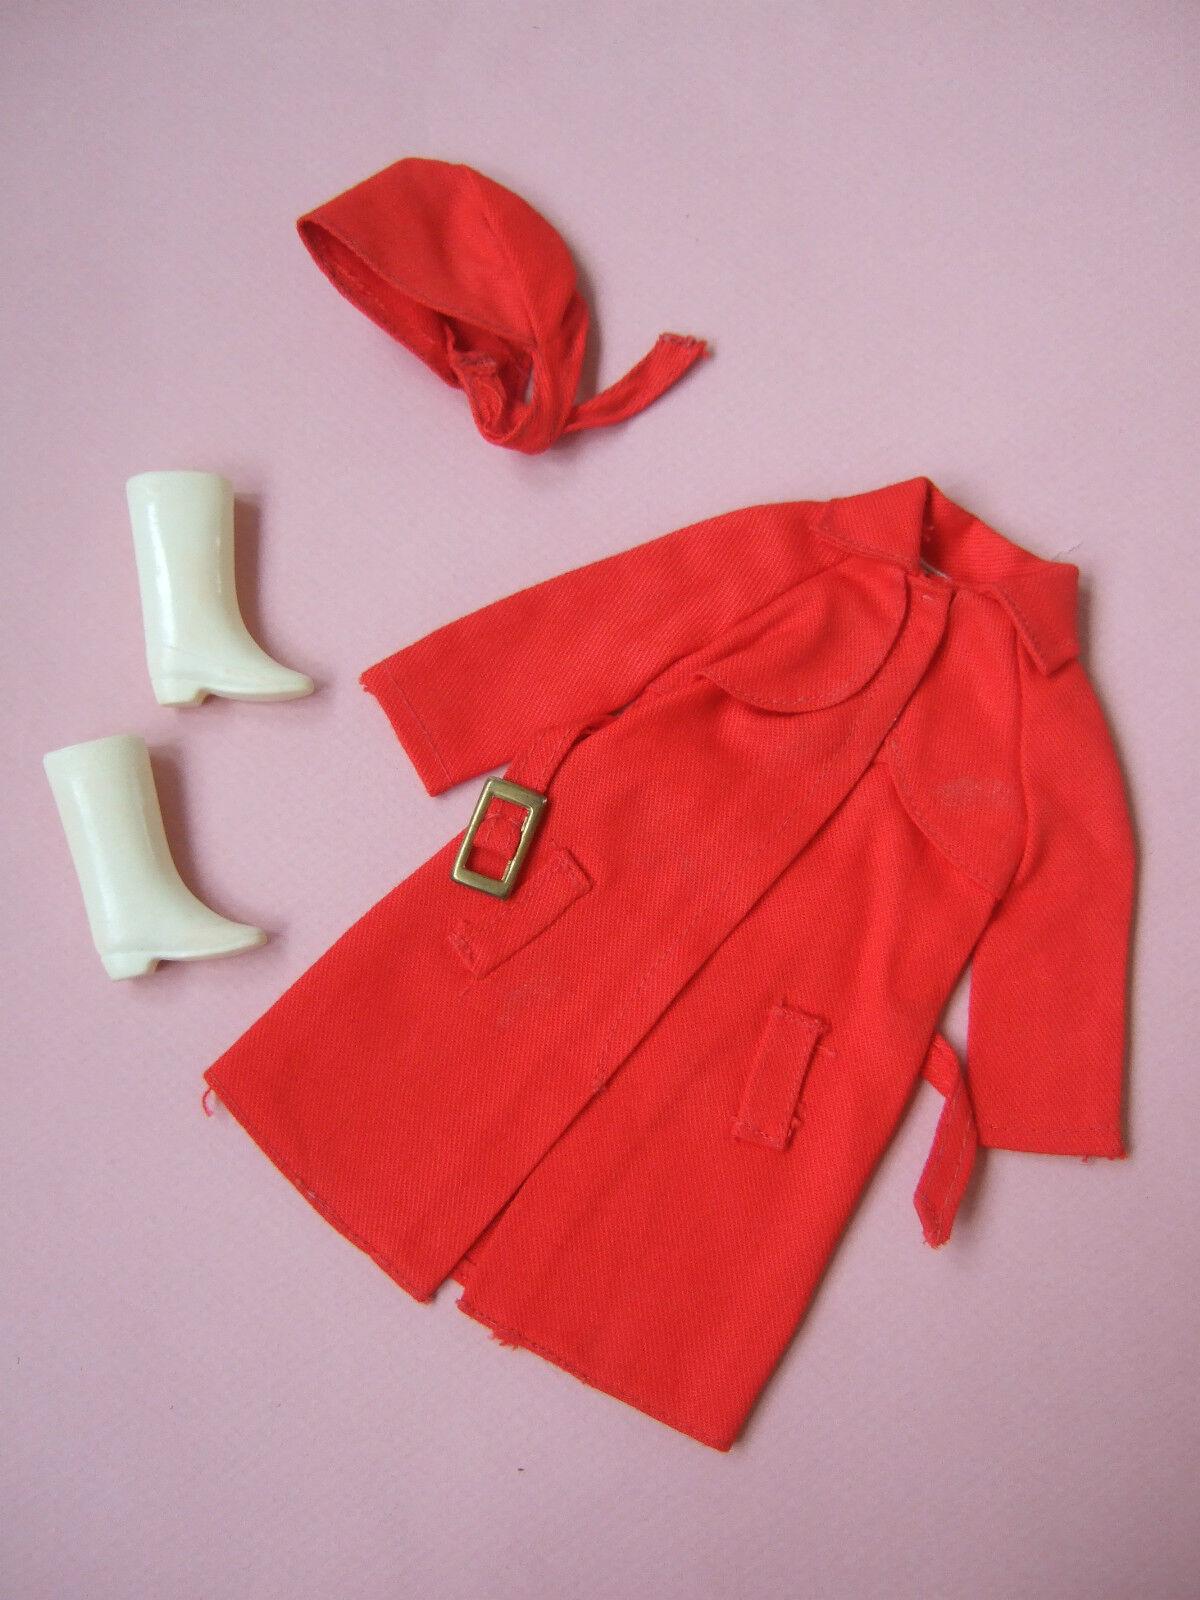 HTF rot for rain rain rain 1971  3409  Mod doll clothes outfit set Vintage Barbie 8d5b11